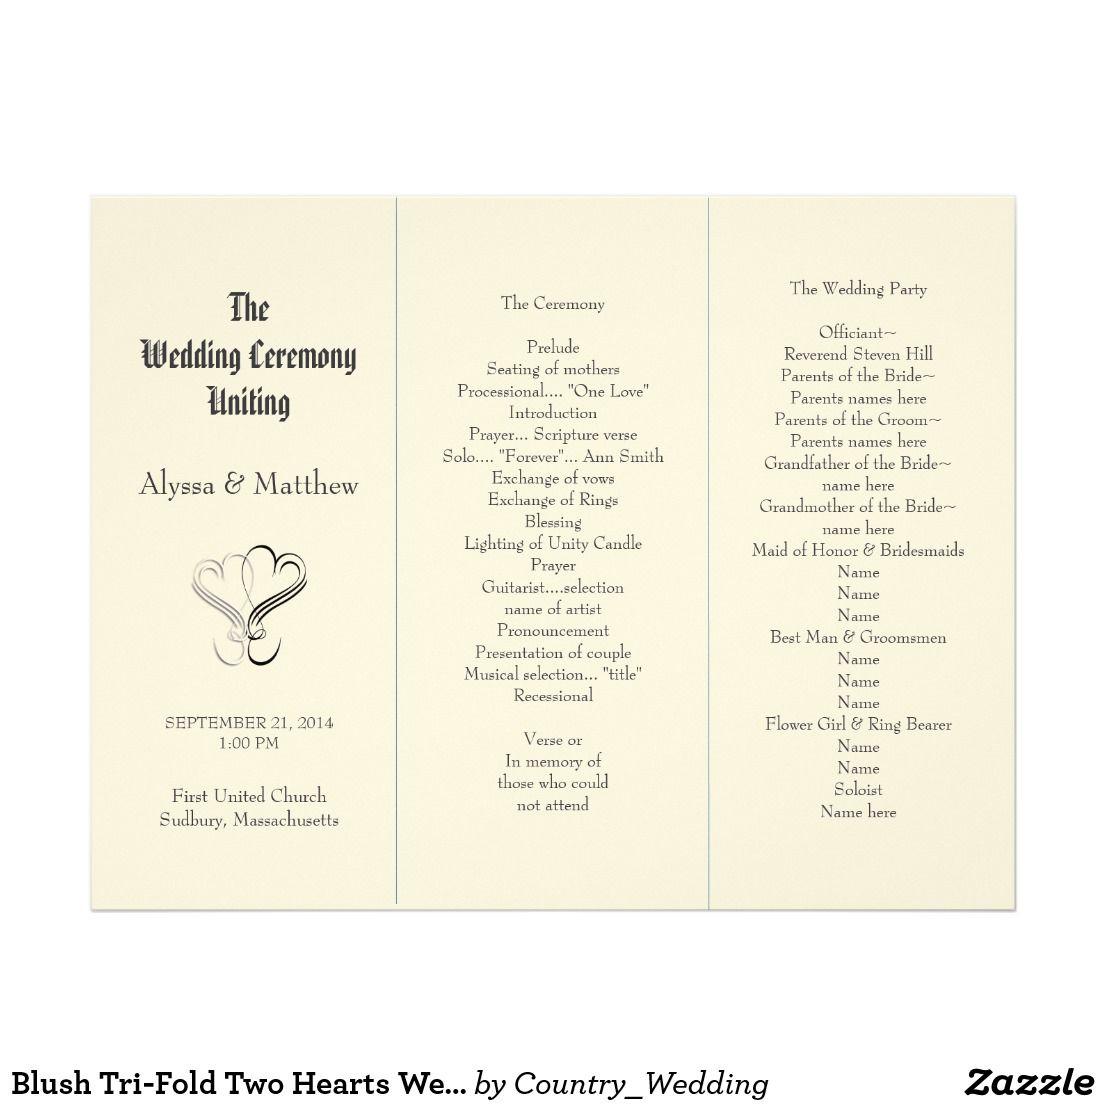 blush tri fold two hearts wedding program template wedding program